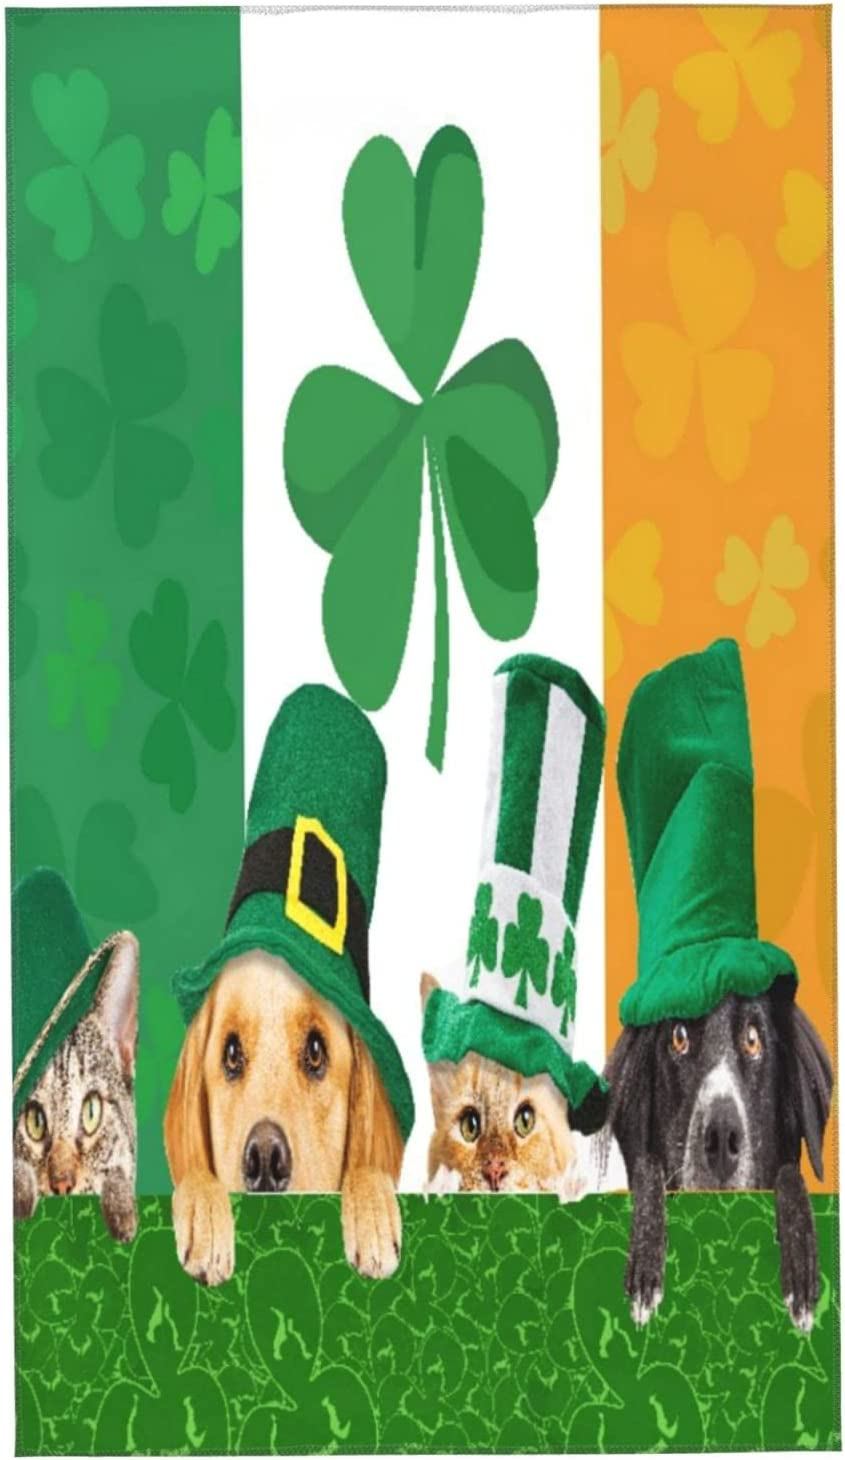 MIGAGA Set of 2 Hand Towels Happy Day Max 54% OFF Cheap bargain Cat Do St. Patrick's Funny